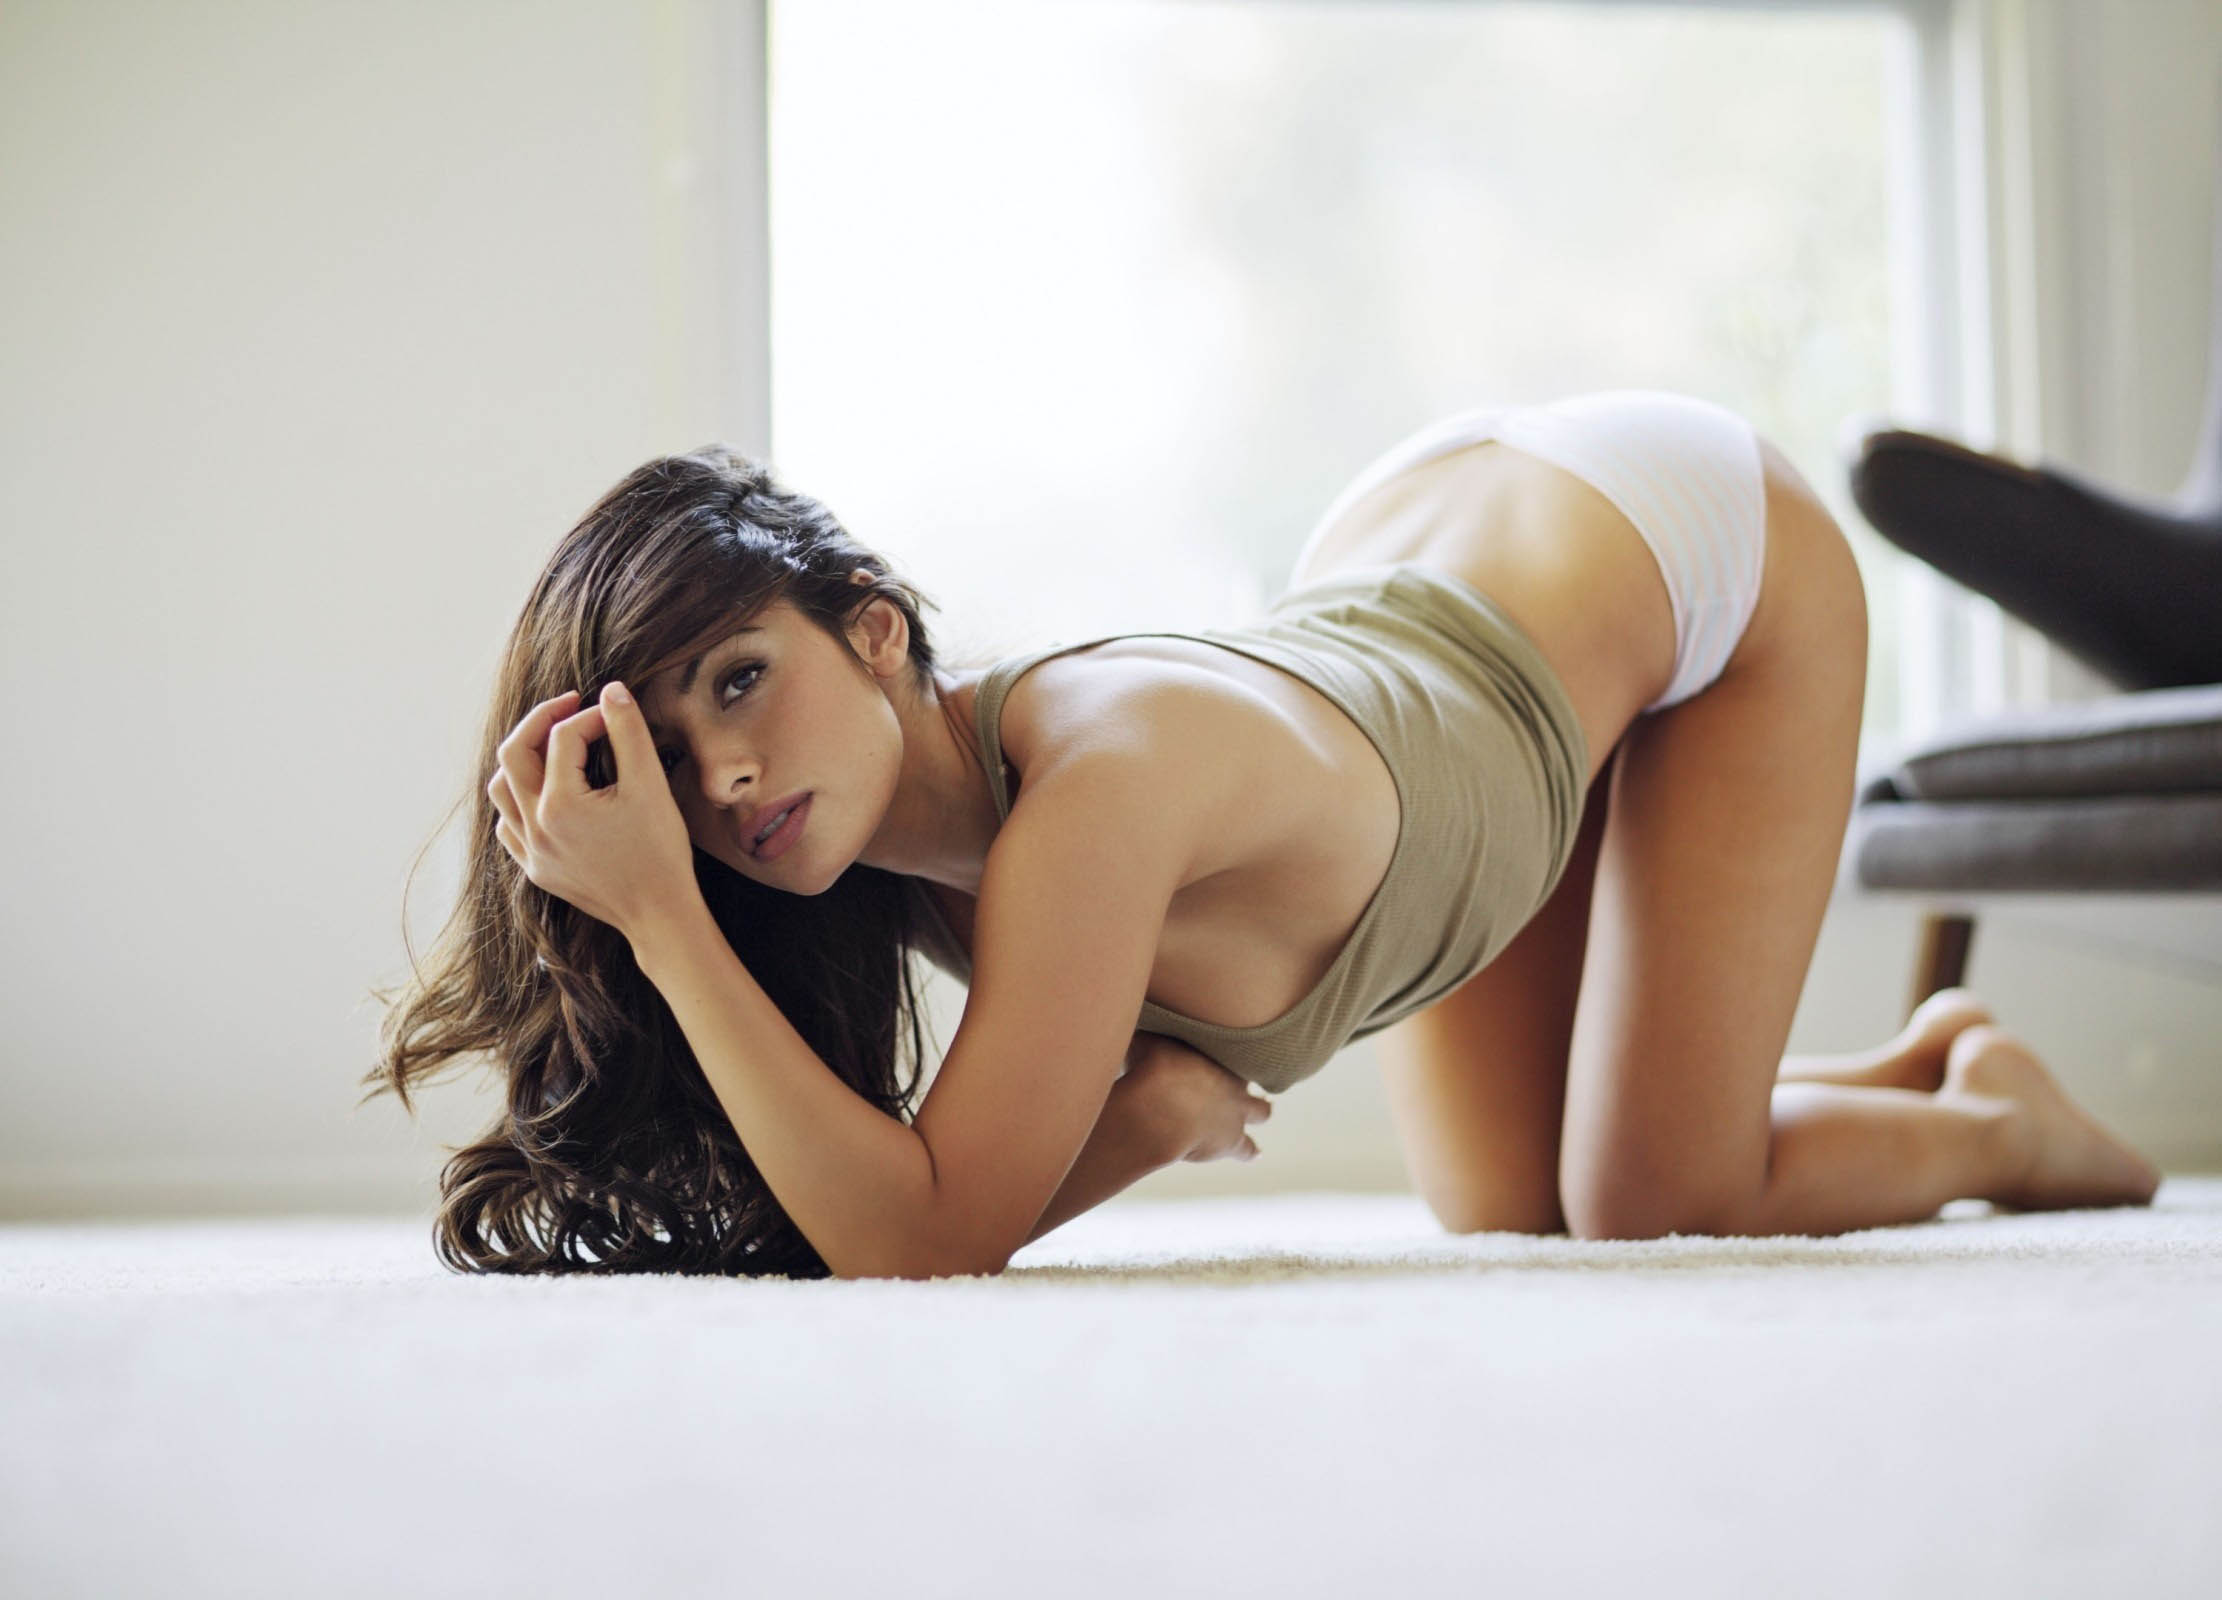 My sexy sex hi nude, sucking dicks in the hood xxx